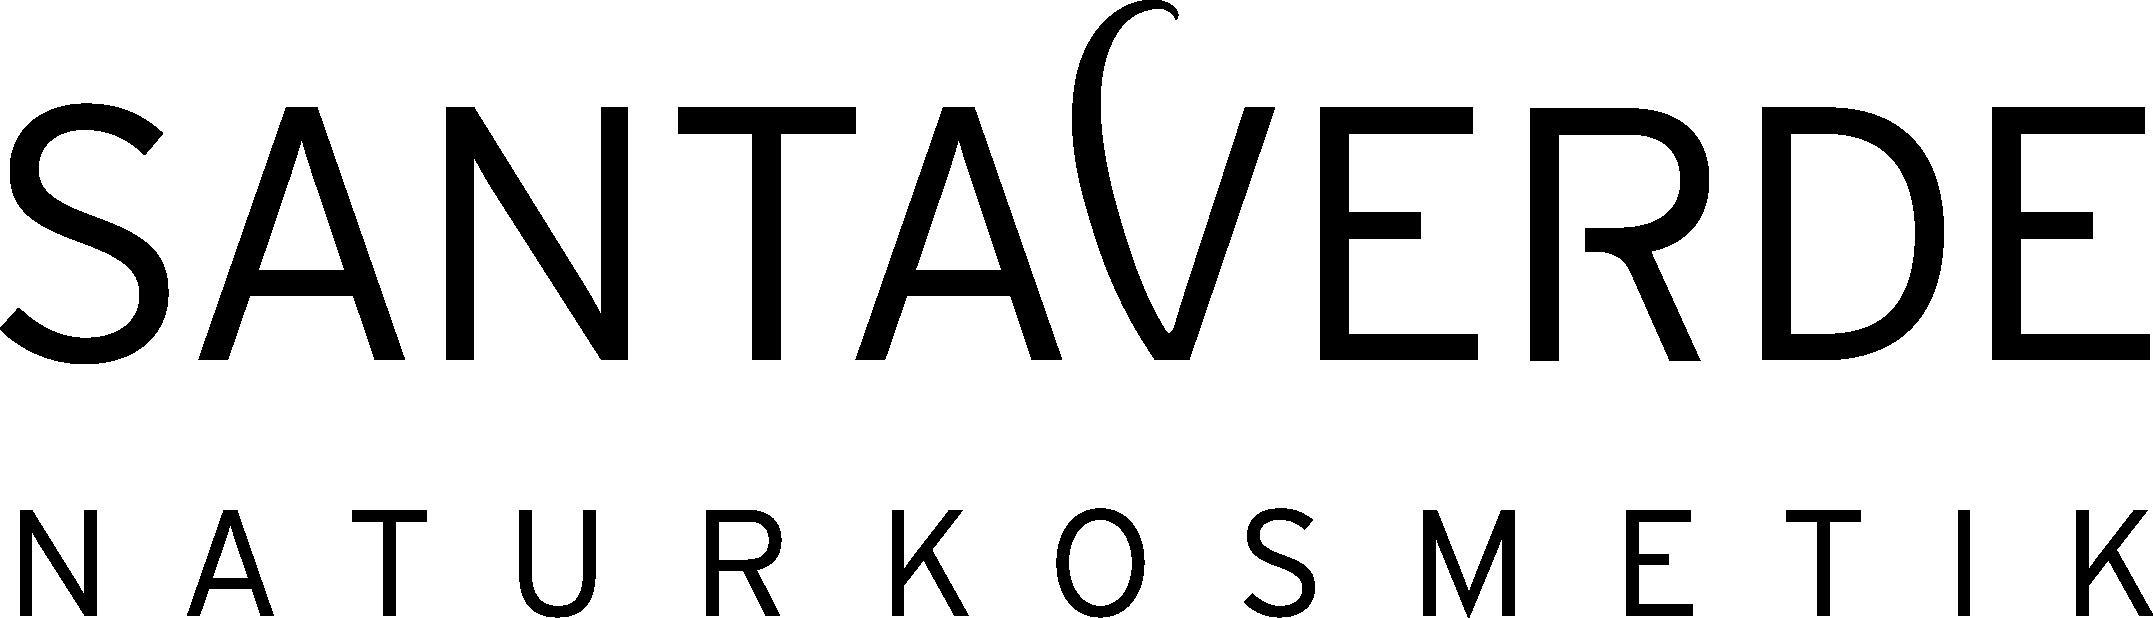 Santaverde_Naturkosmetik_Logo_black_DEU.jpg